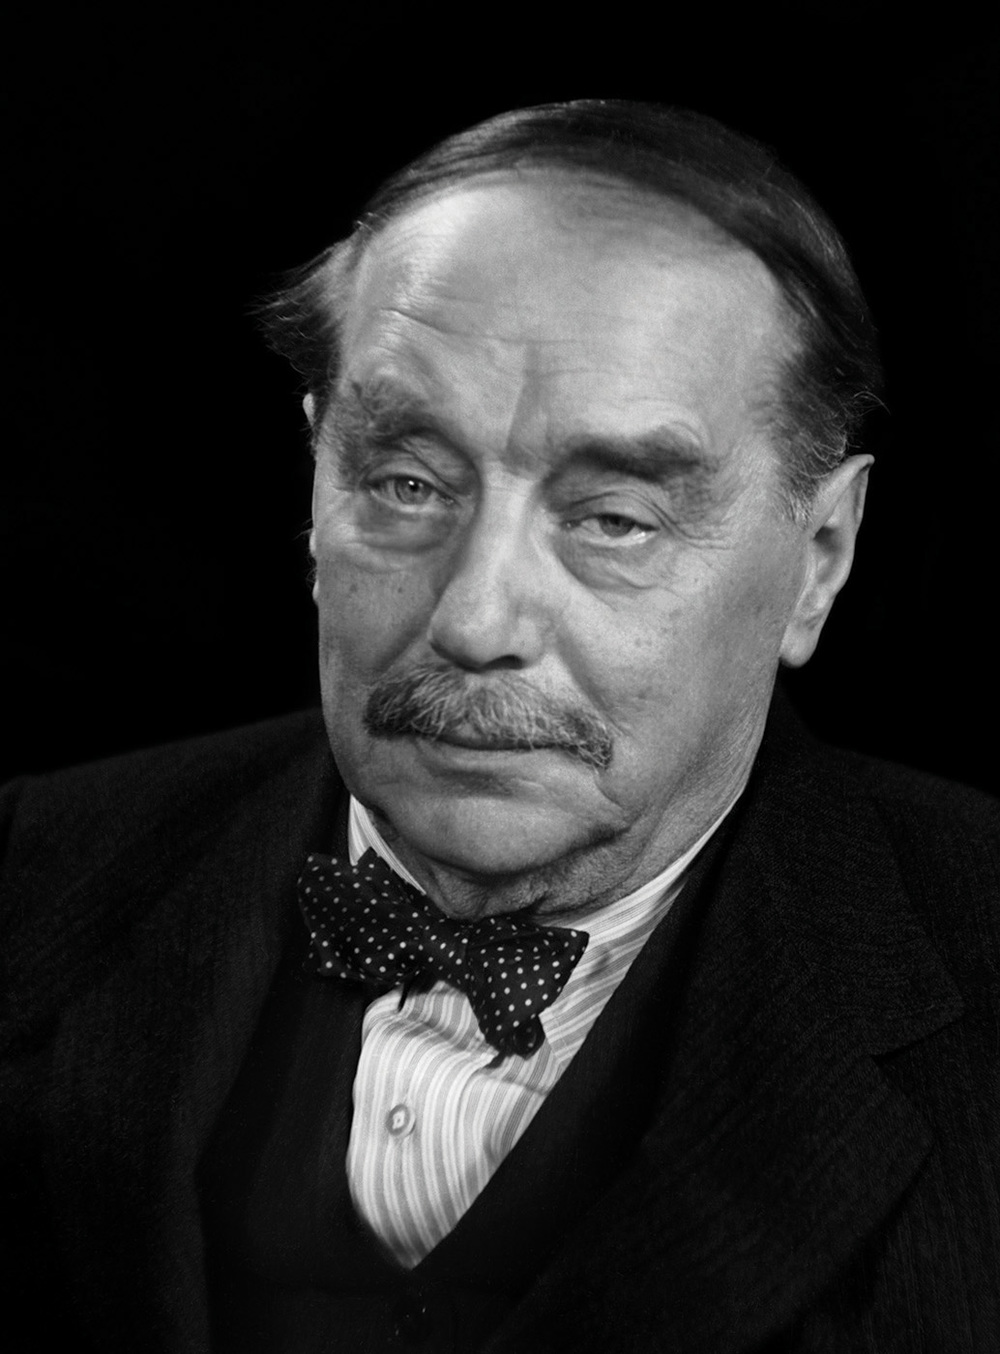 H. G. Wells, London, 1938